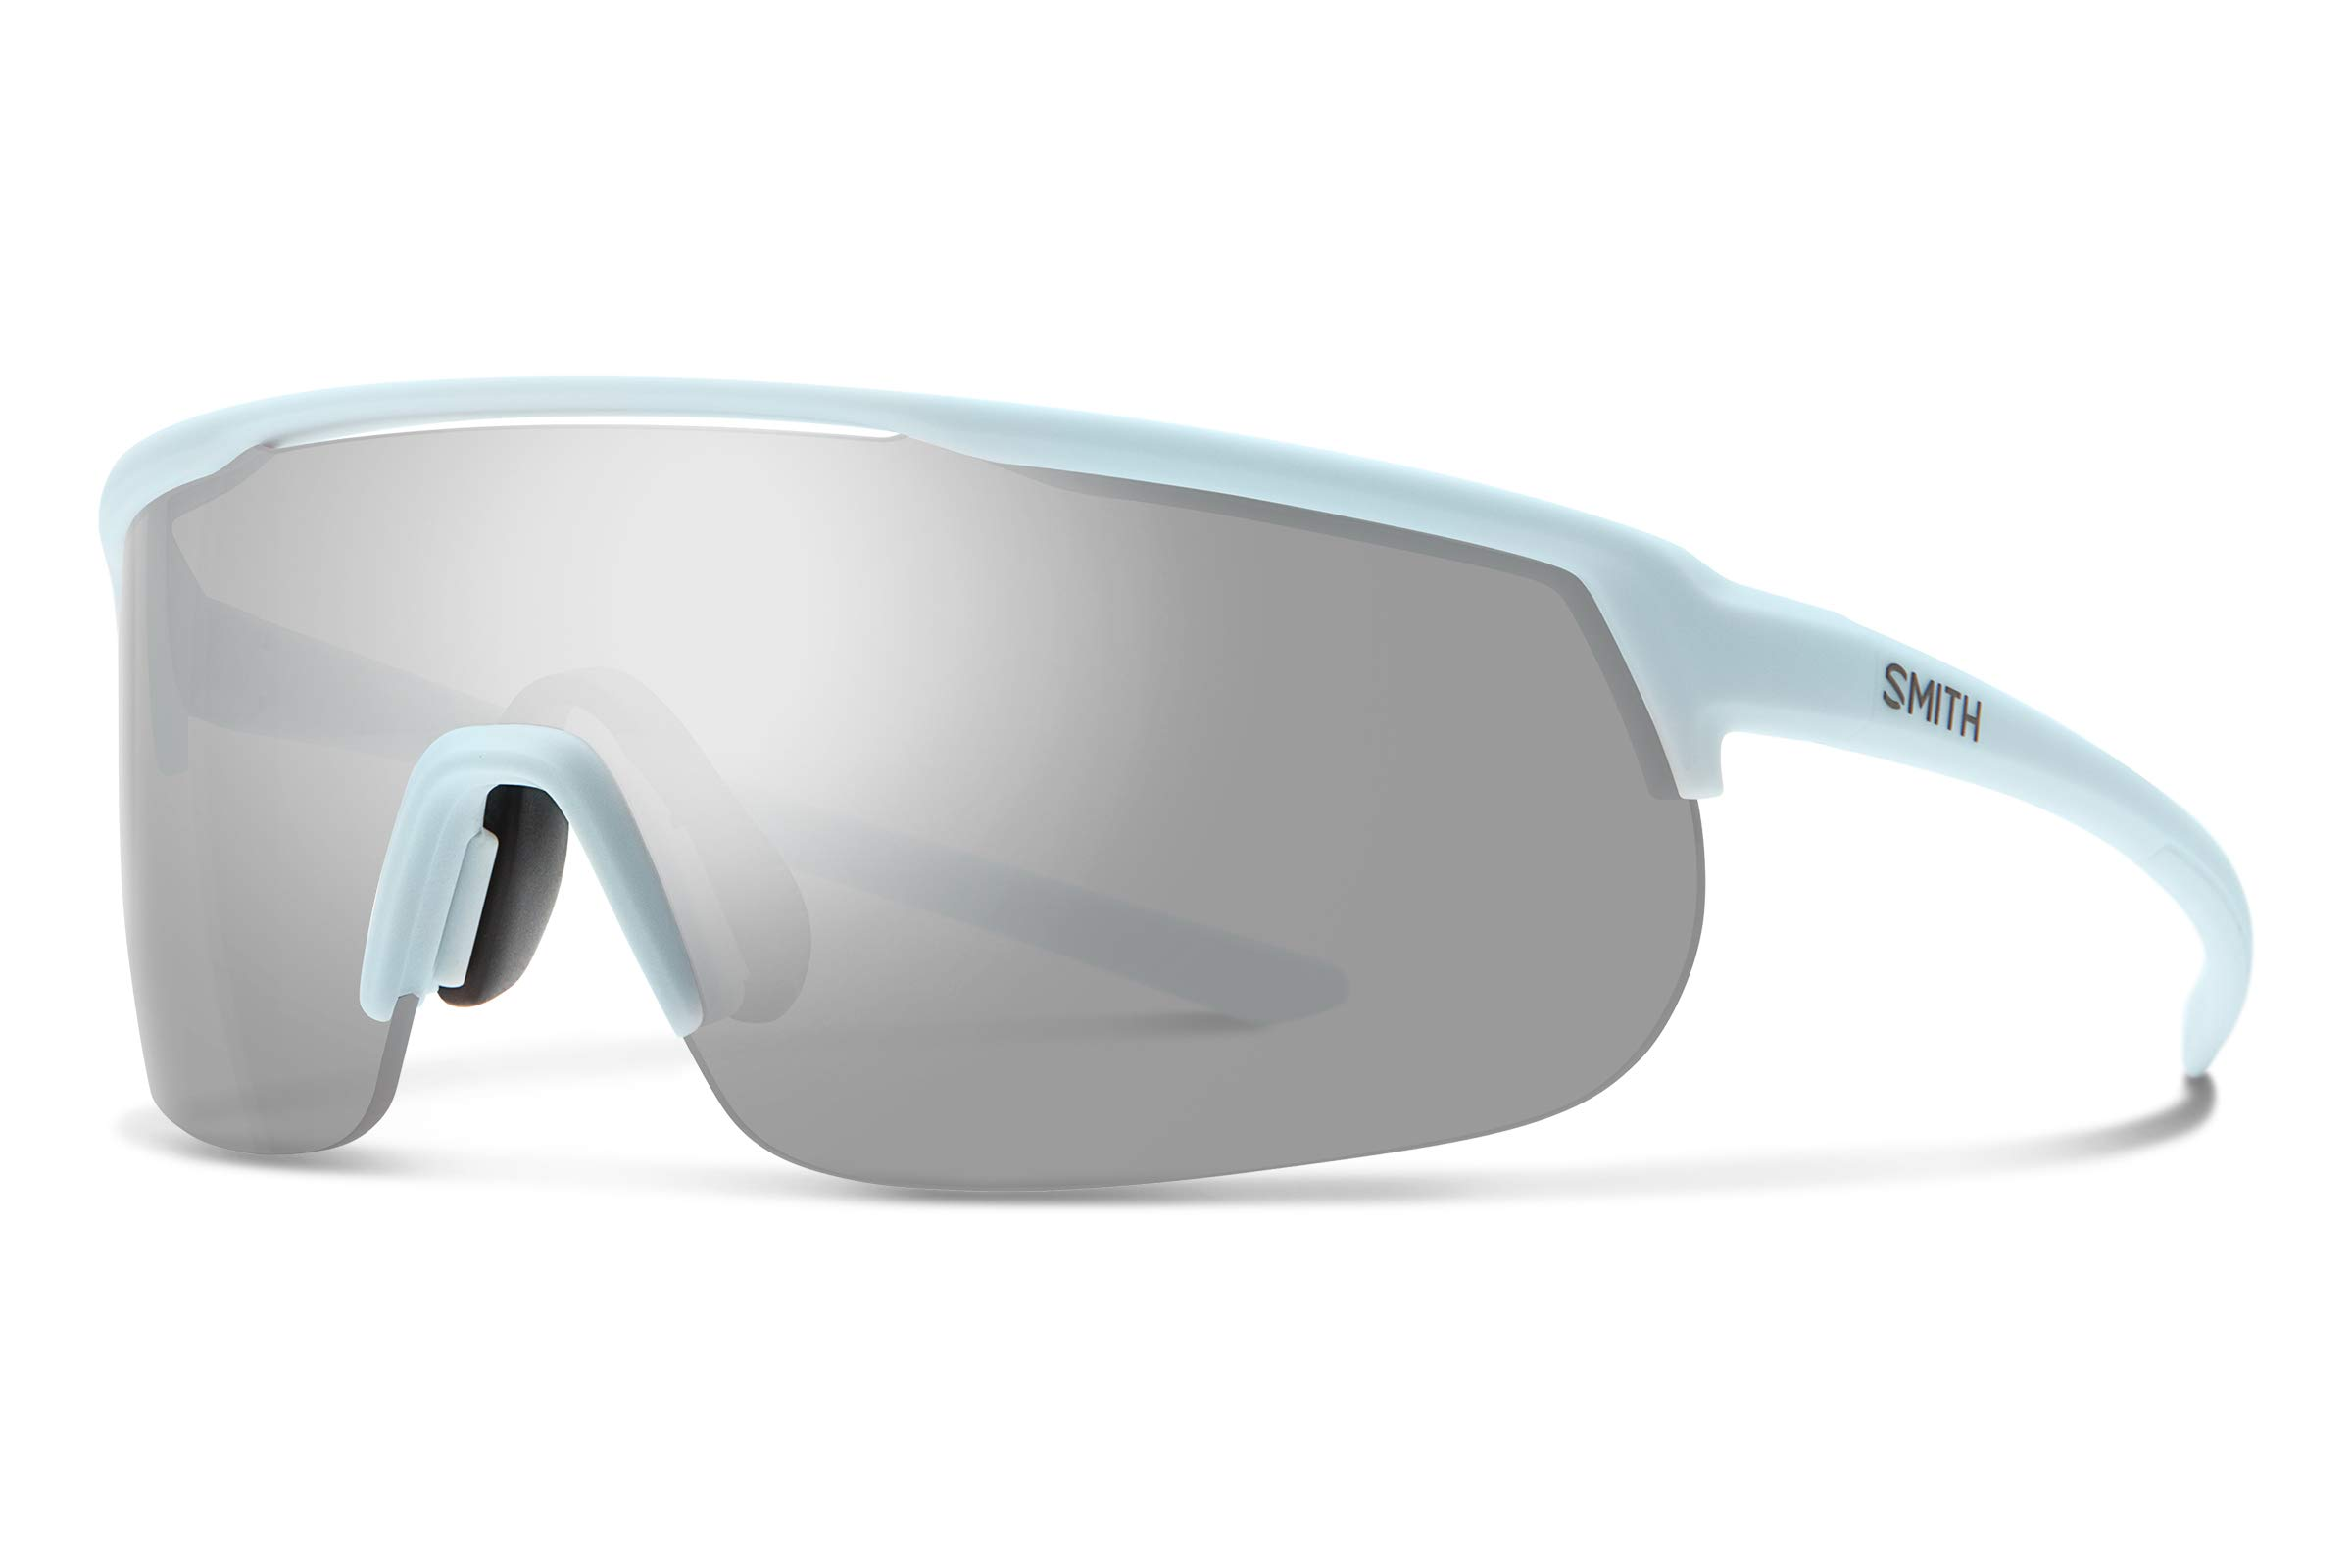 Smith Track Stand Chromapop Sunglasses, Matte Powder Blue, Chromapop Platinum/Contrast Rose